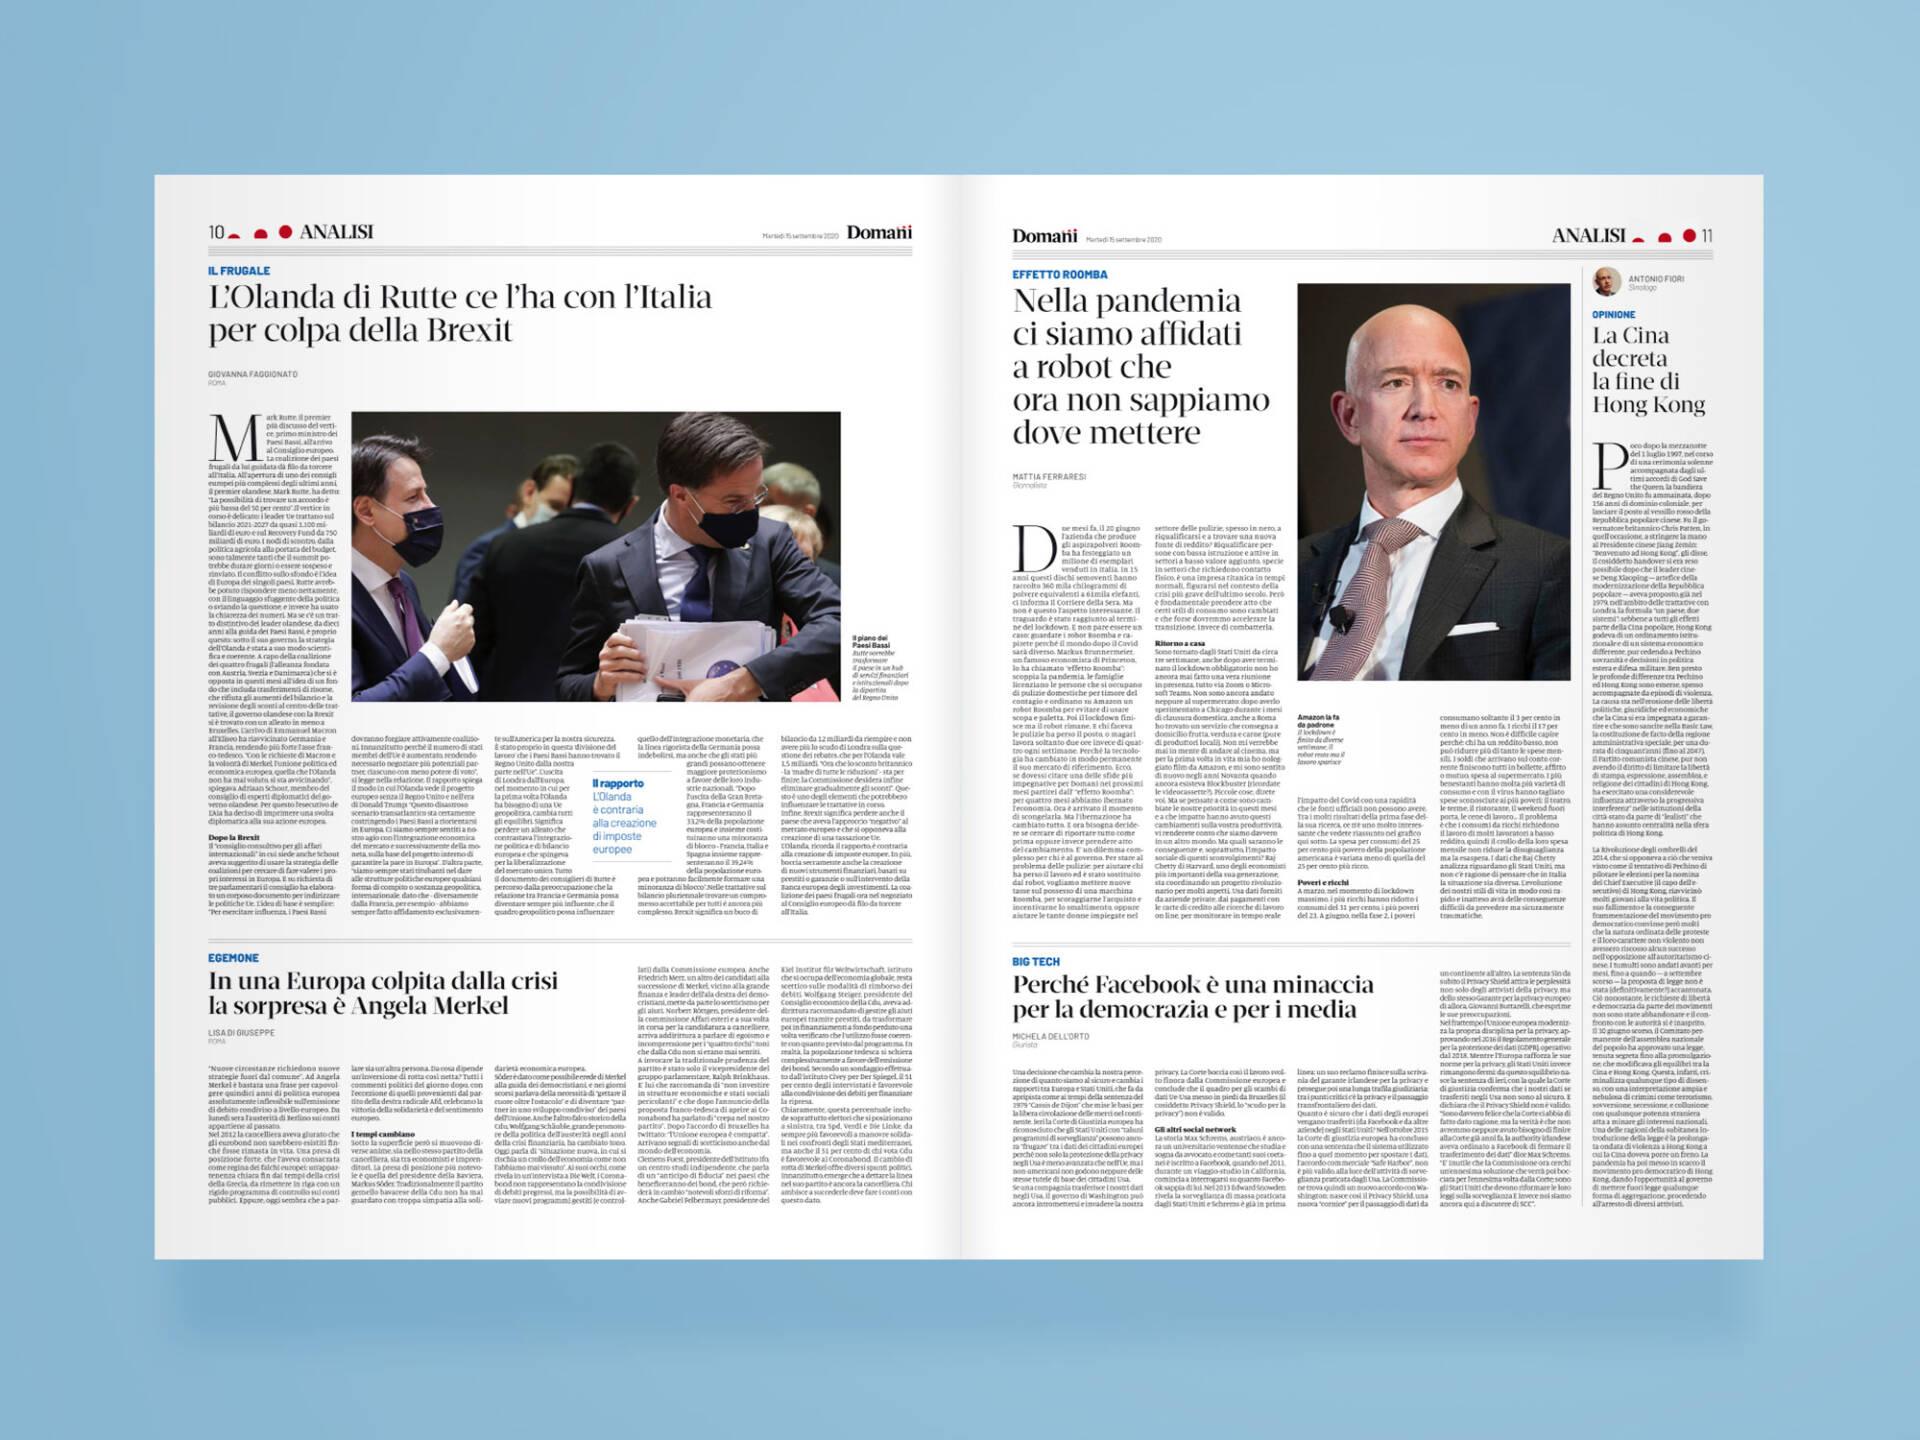 Domani_Print_06_Wenceslau_News_Design